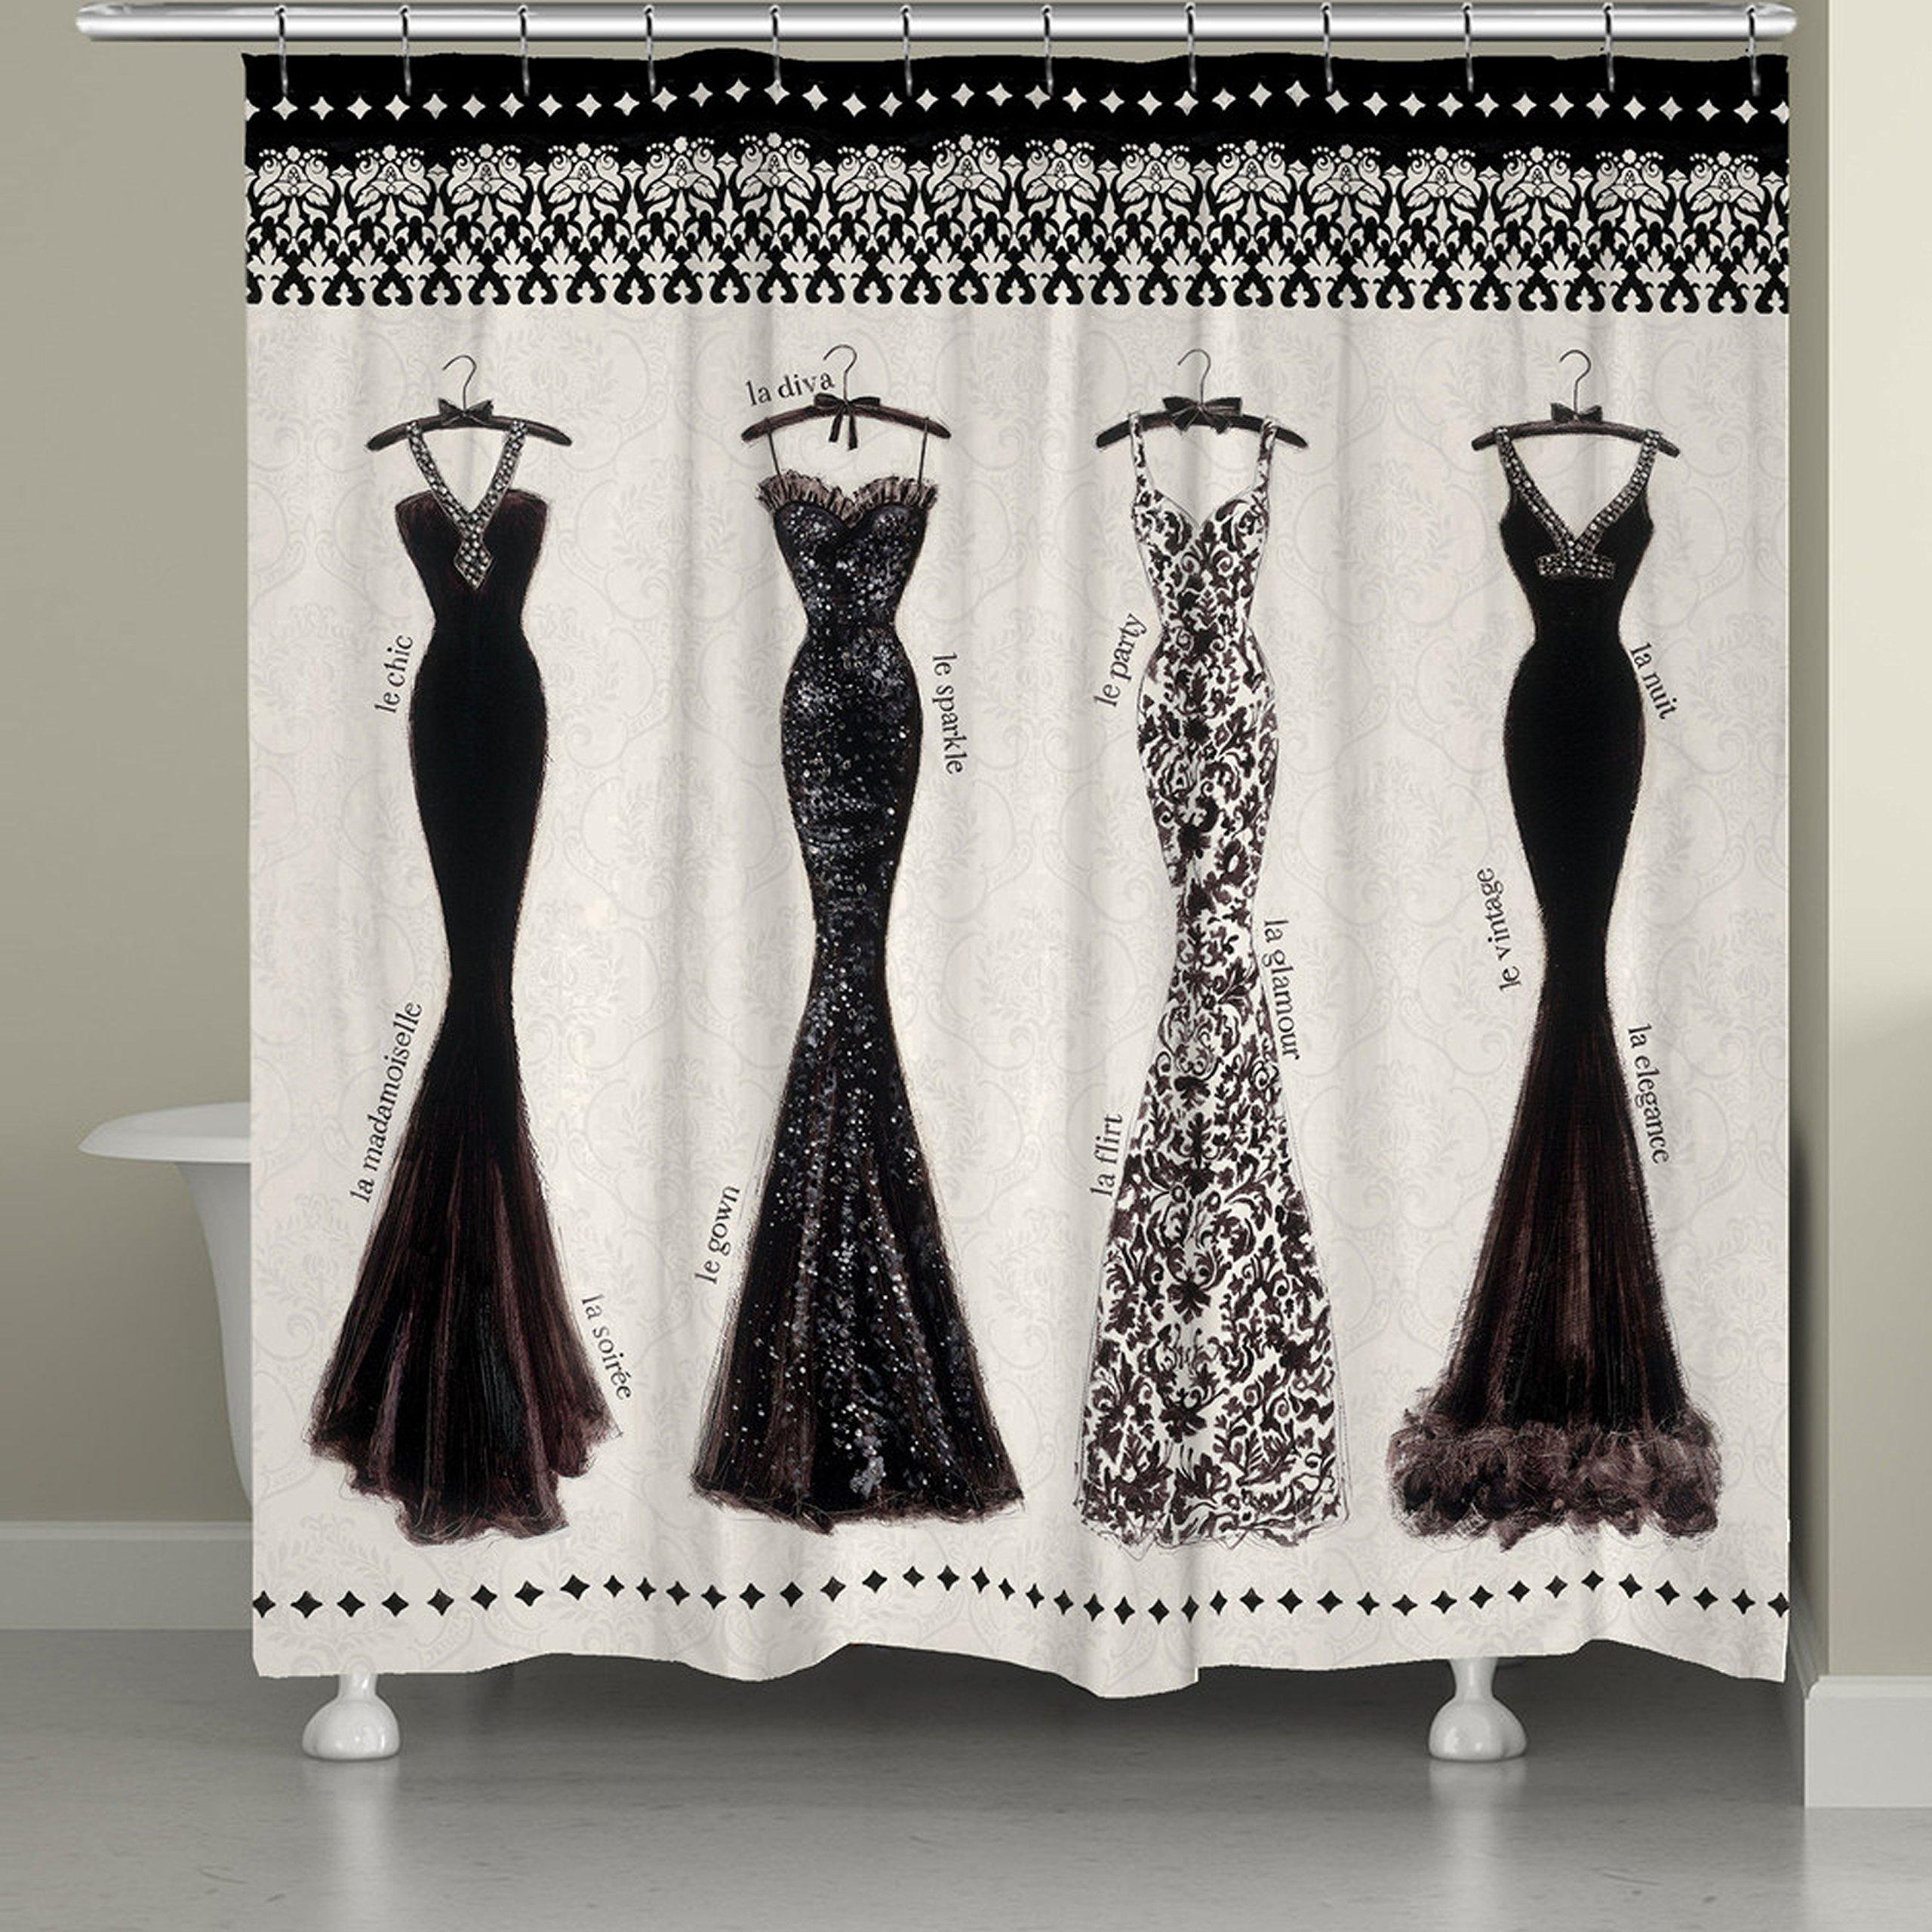 Laural Home Couture Noir Shower Curtain, 71'' x 74'', Black/White